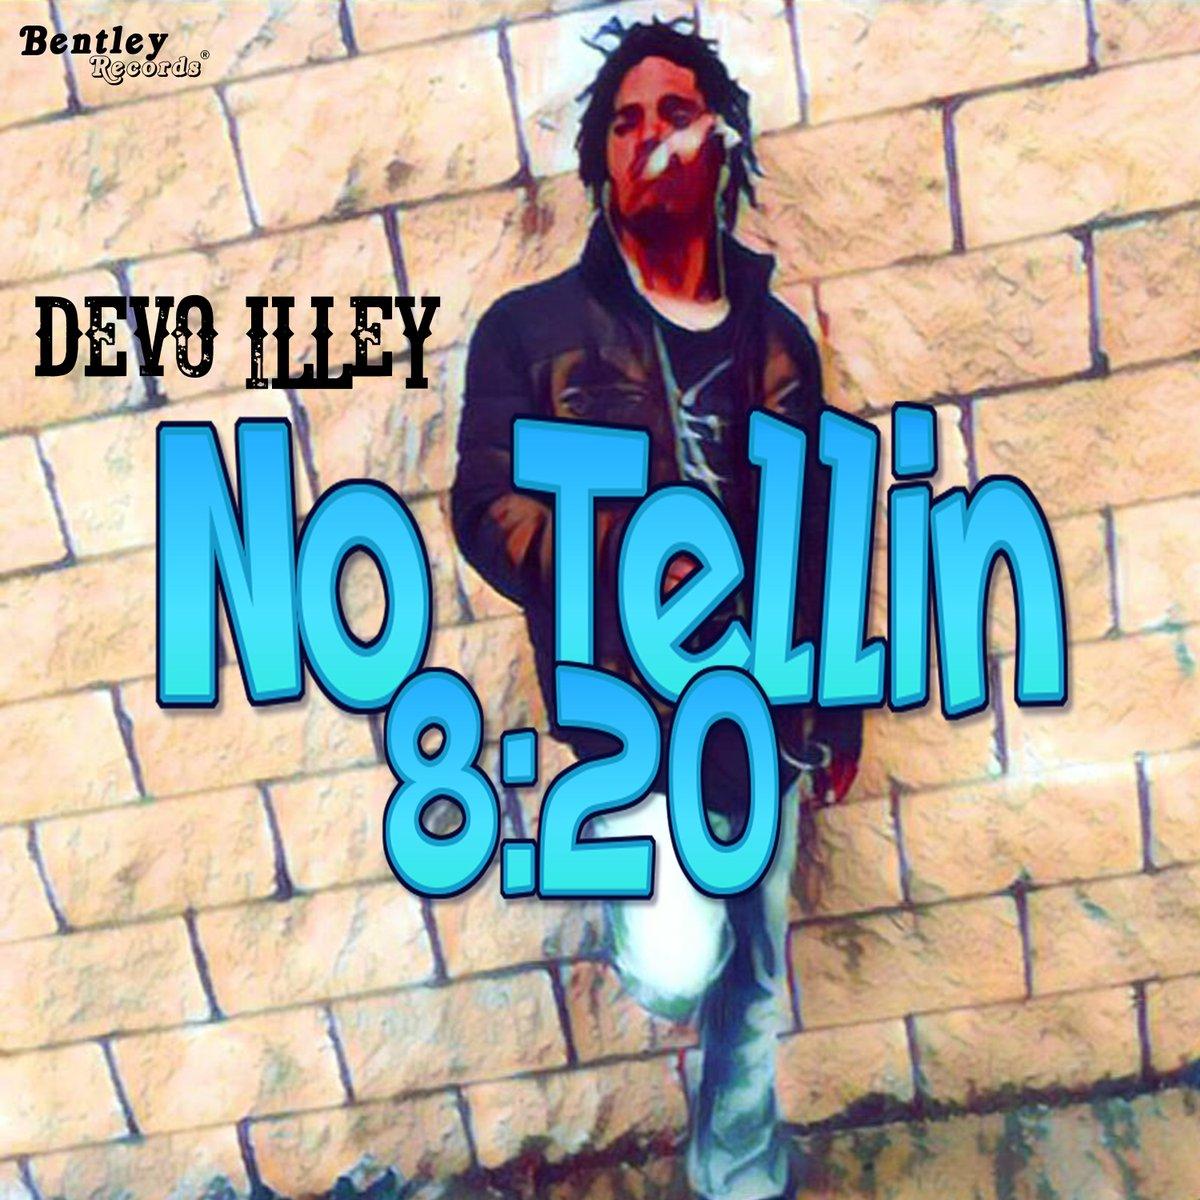 "New Music ""Ain't No Tellin"" @yrndevoilley COMING OUT SOON #BentleyRecords #BentleyRecordsRED #BentleyGang #NewMusic #Music #Release #RecordLabel #HipHop #Rap #Pop #Promo #Retweet #Repostpic.twitter.com/5NTuOXsqa8"